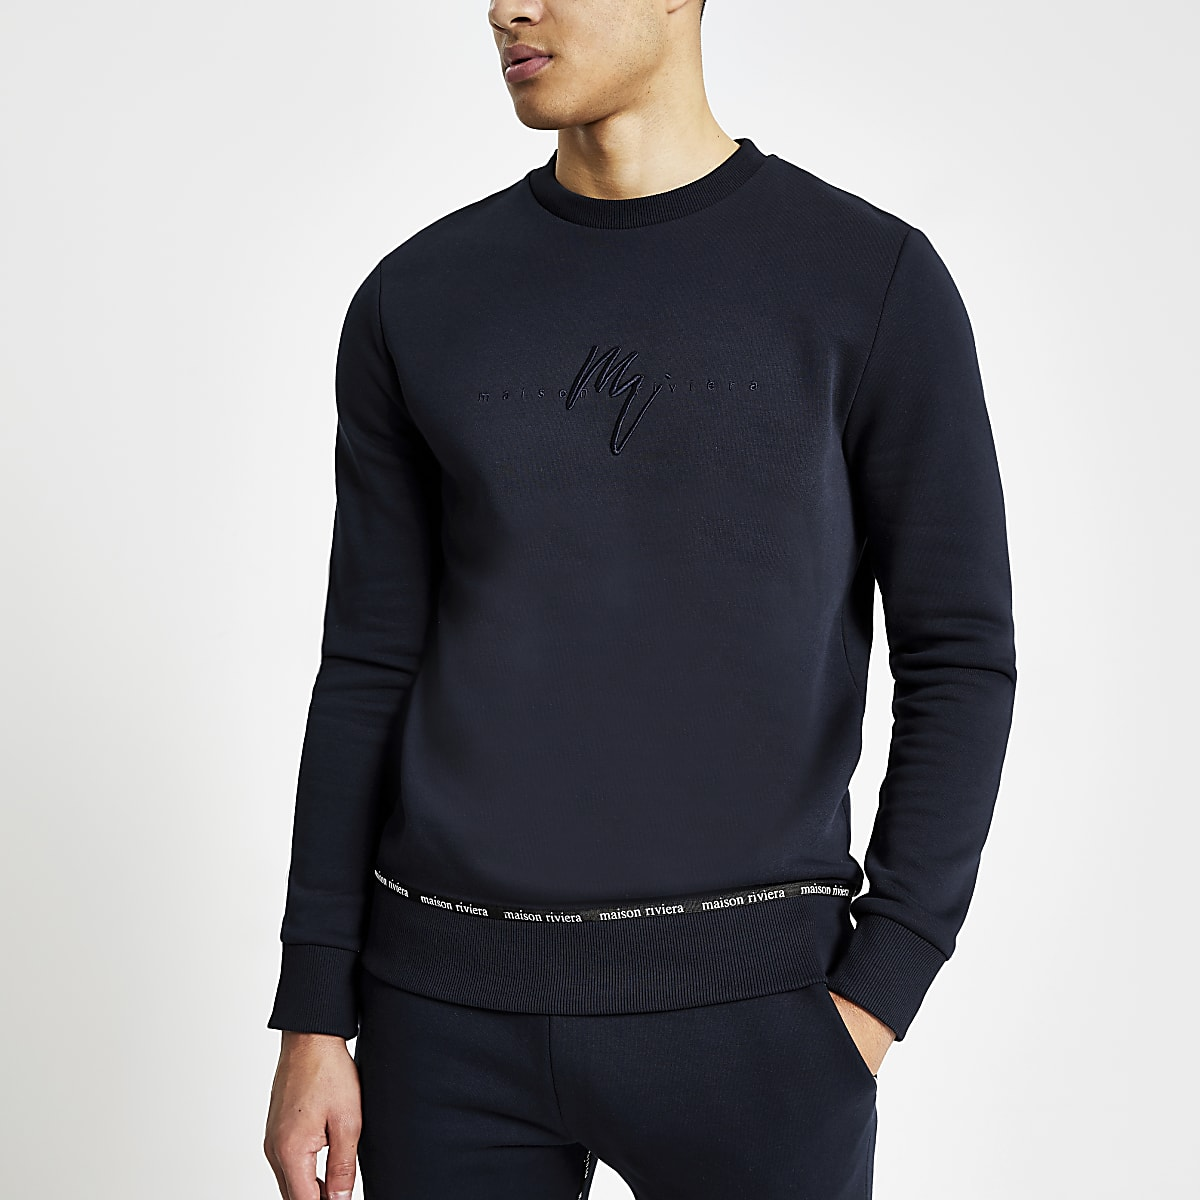 Navy Maison Riviera taped sweatshirt